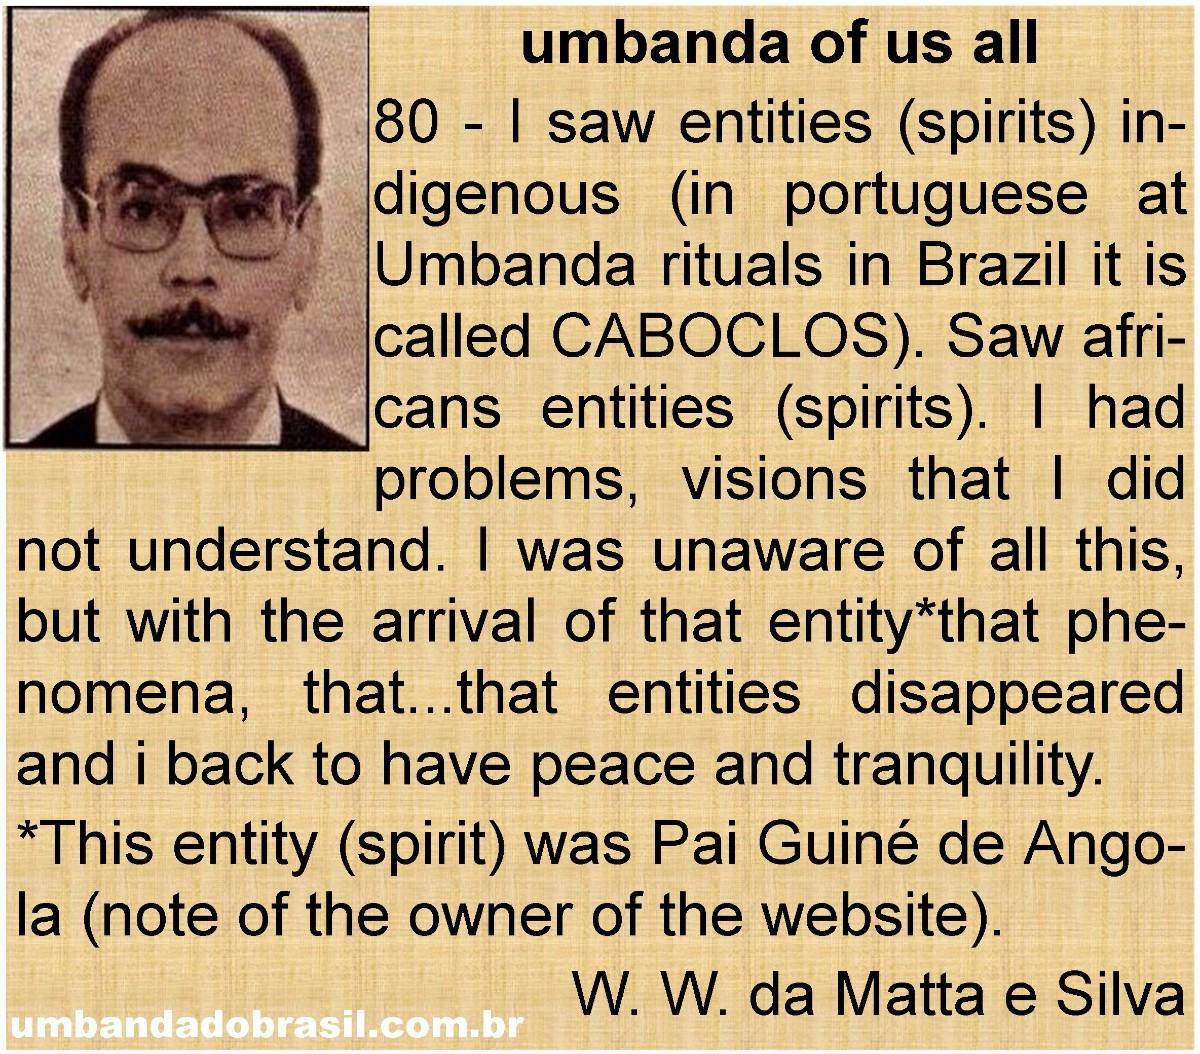 http://img.comunidades.net/umb/umbandadobrasil/80_1_frases_de_mata_e_silva.jpg